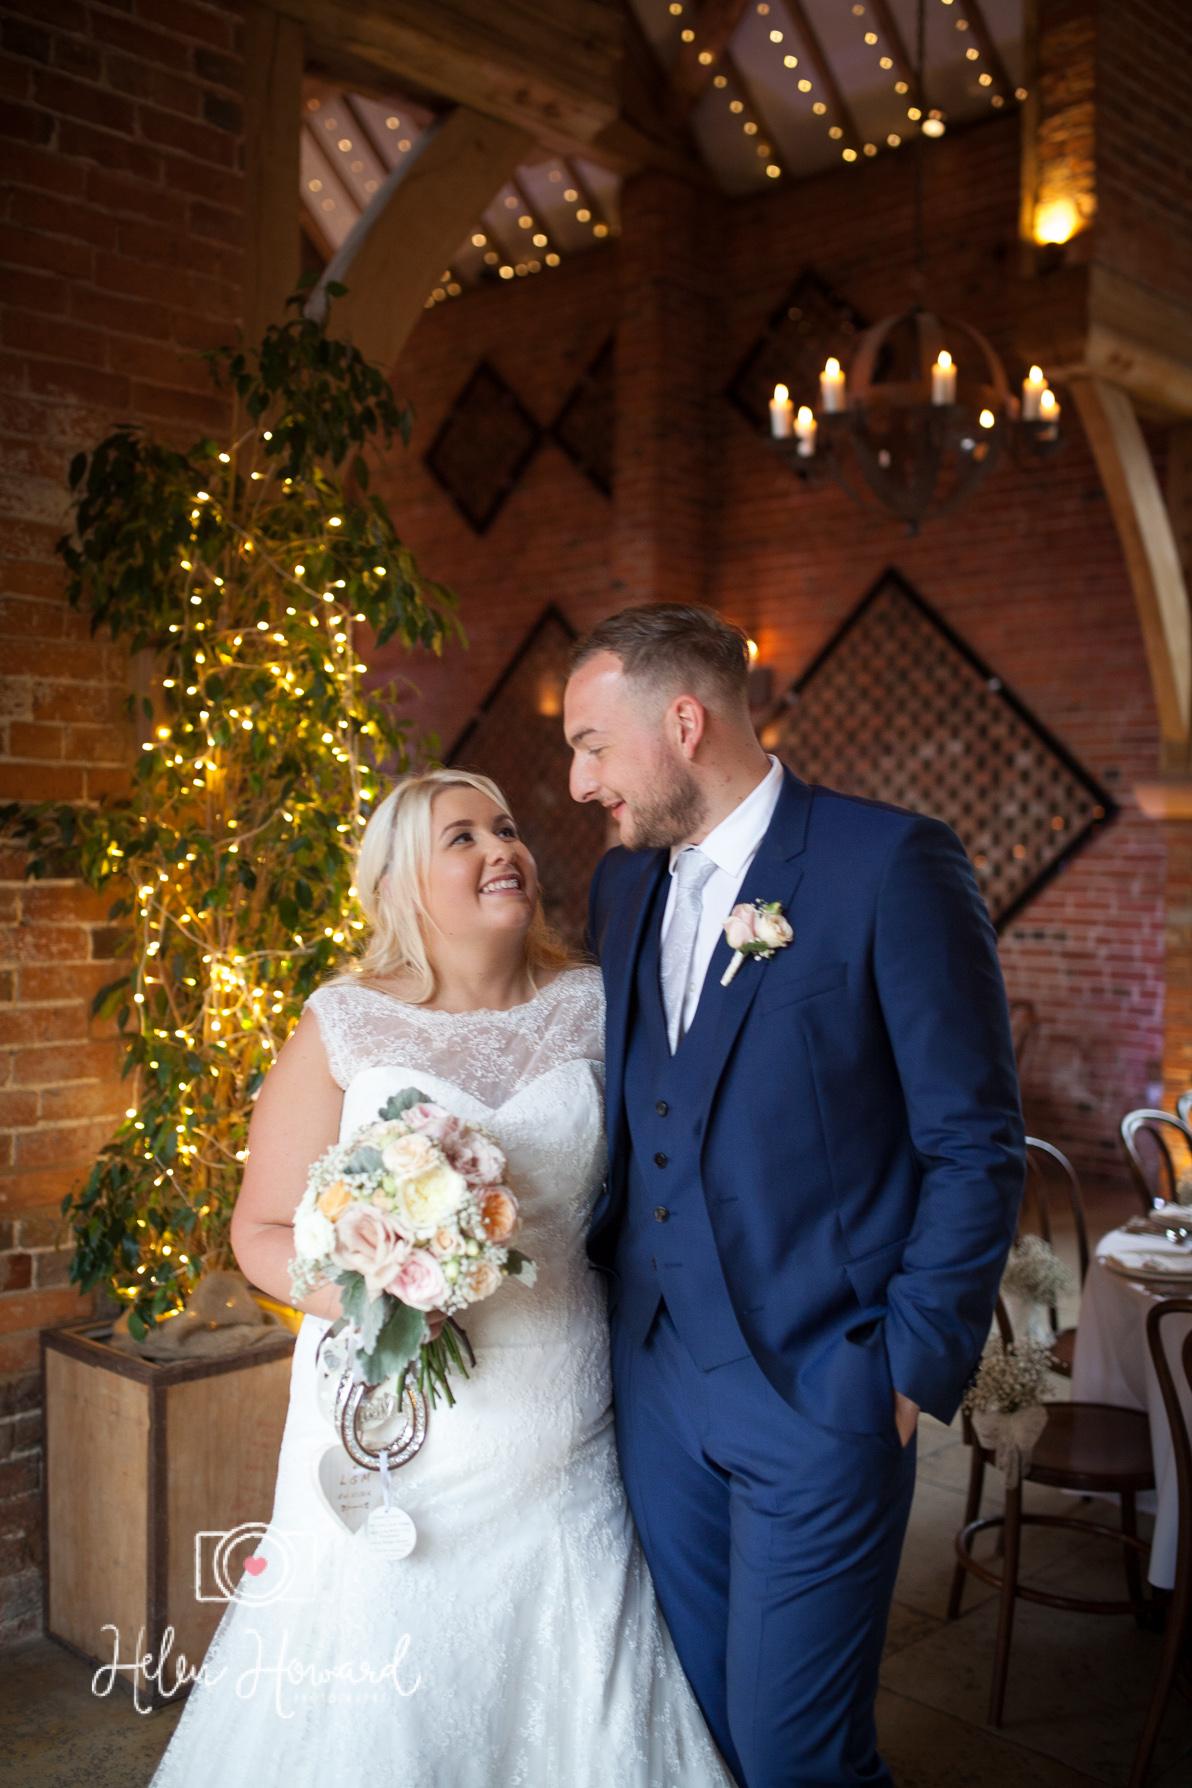 Shustoke Farm Barns Wedding Photography by Helen Howard-29.jpg